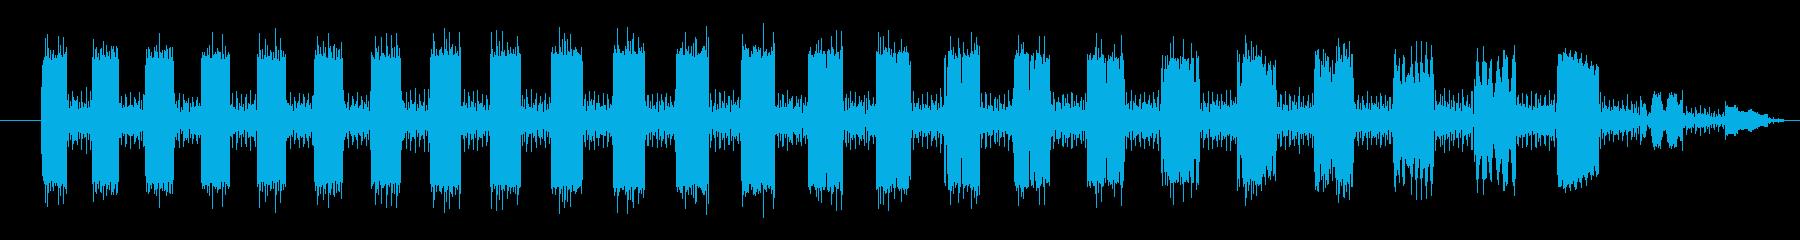 FX 作業ロボット03の再生済みの波形